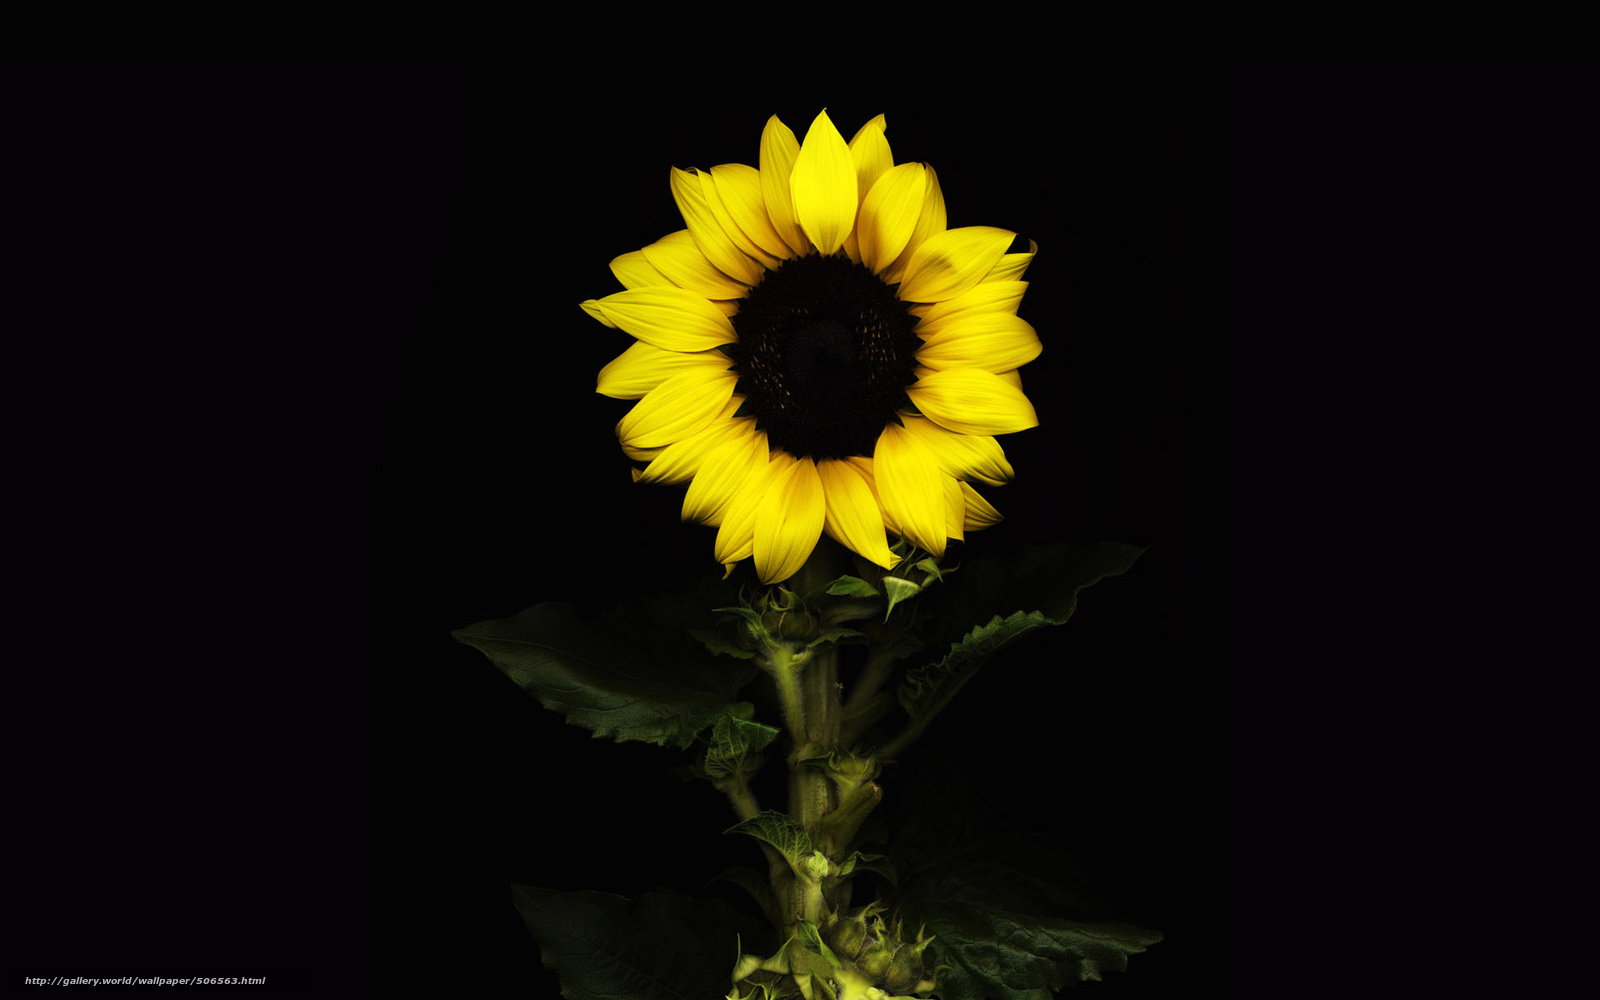 Sunflower Tumblr Backgrounds Wallpaper  paperliefcom